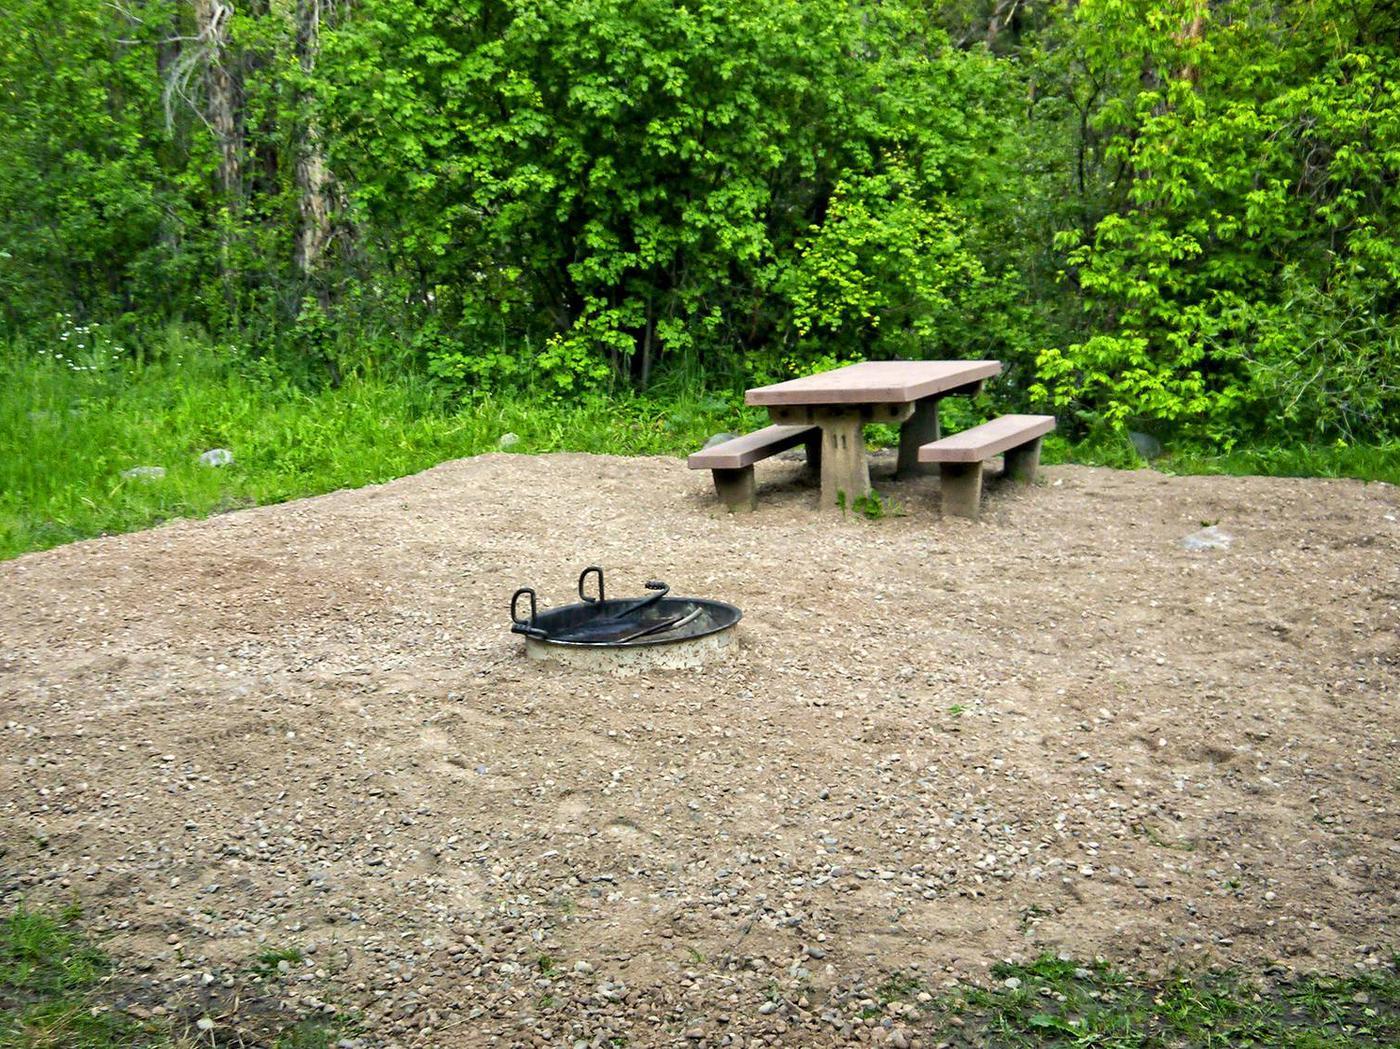 lc-site11-previewLeigh Creek Site 11